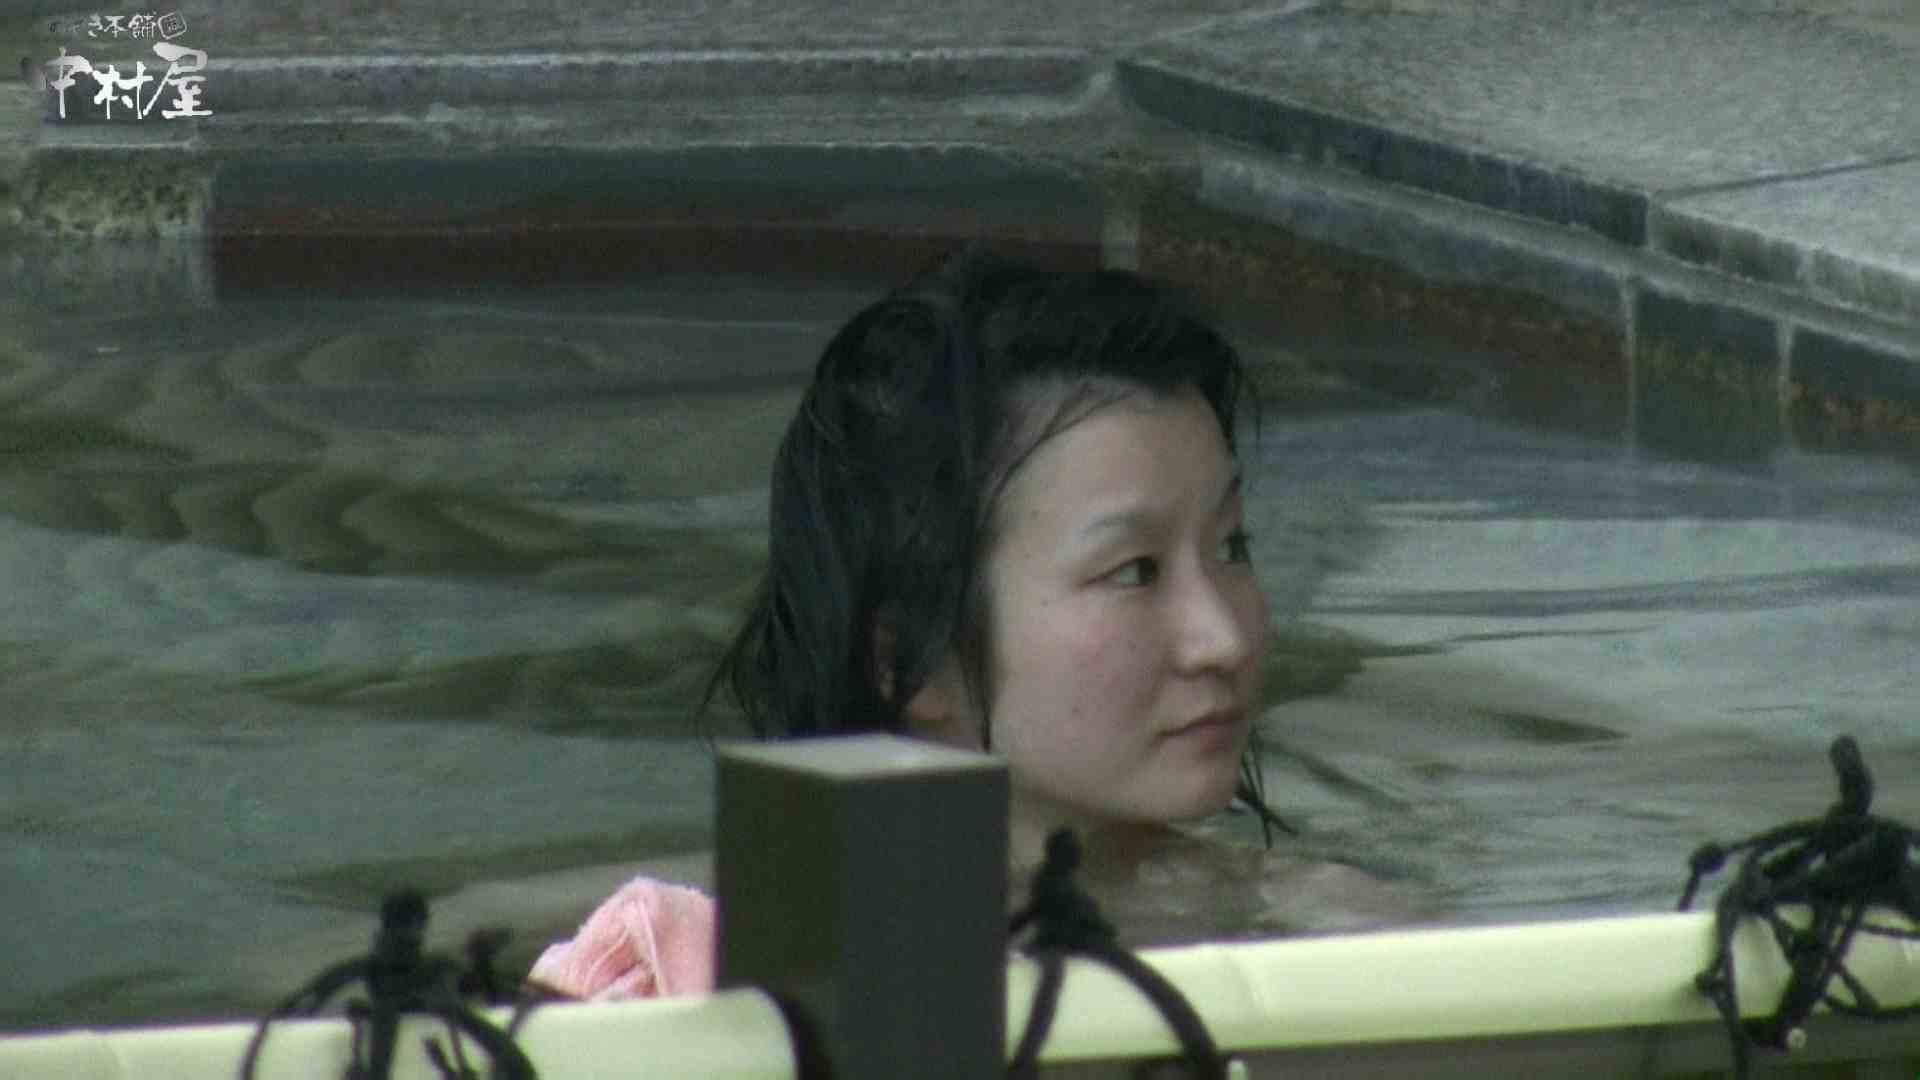 Aquaな露天風呂Vol.982 露天風呂編   盗撮シリーズ  78PIX 33